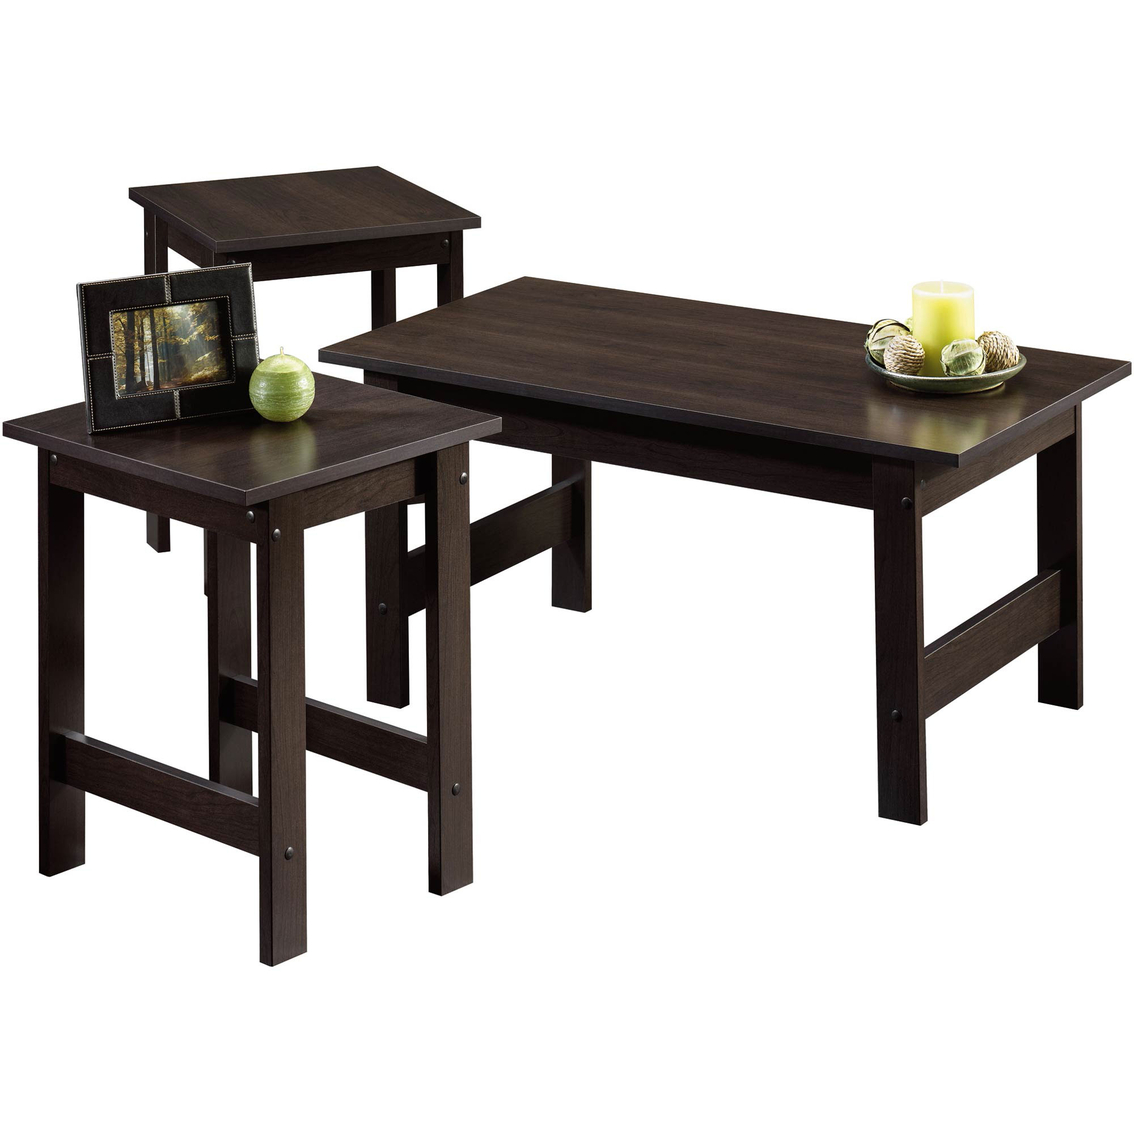 Sauder 3 Pc. Table Set | Living Room Tables | Home & Appliances ...